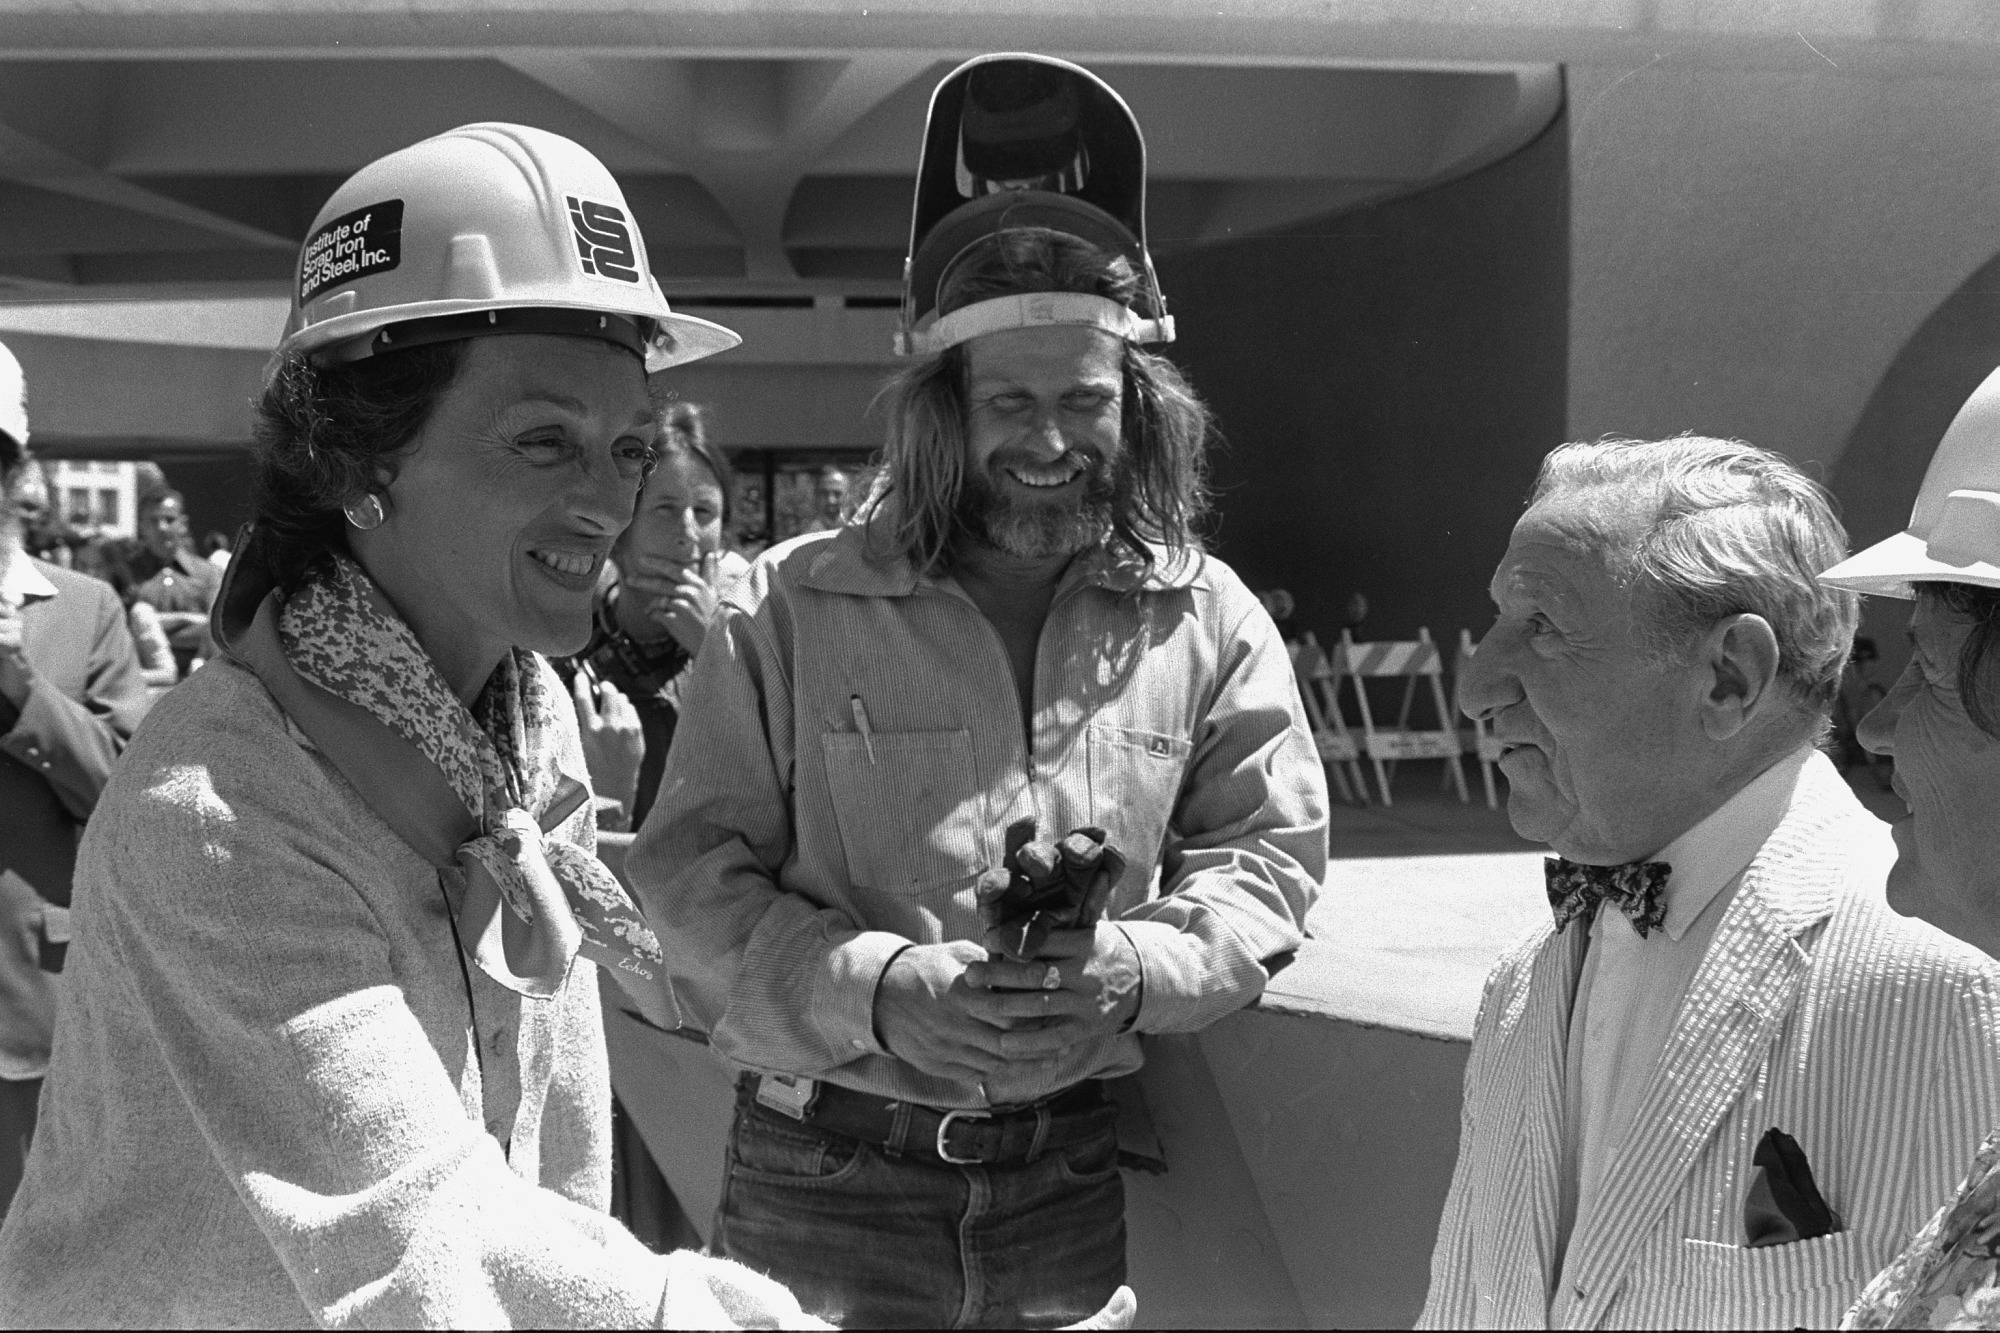 Joan Mondale Greeting Joseph Hirshhorn